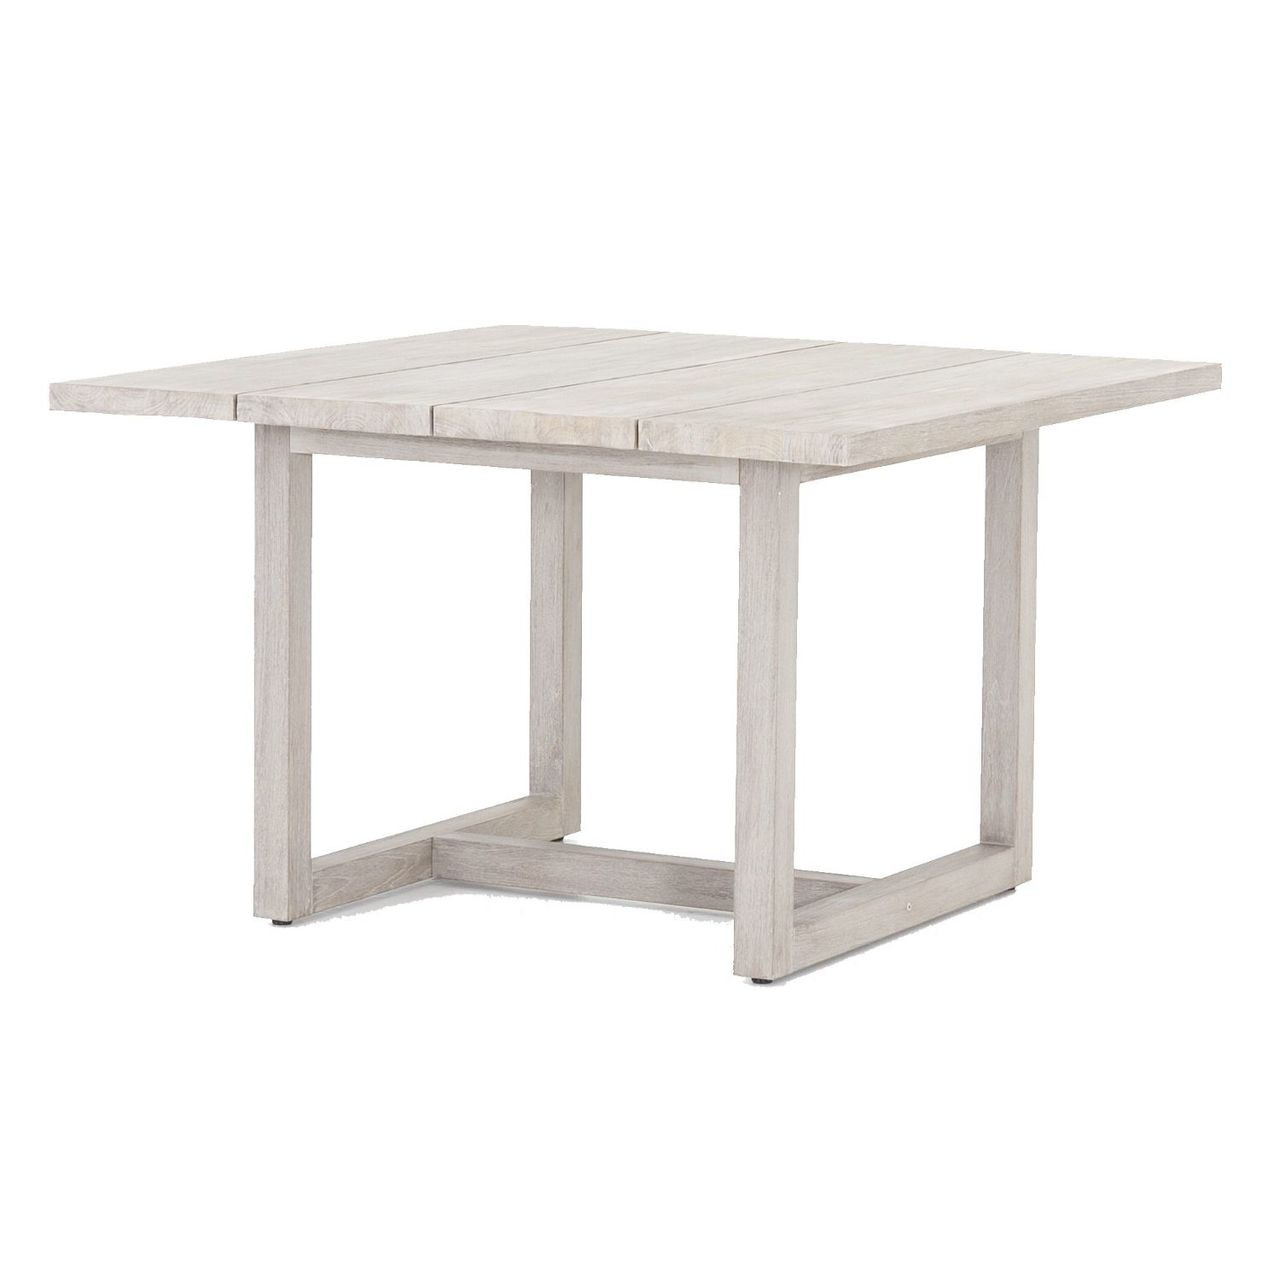 Stapleton Grey Teak Wood Square Outdoor Dining Table Zin Home - Square wood outdoor dining table